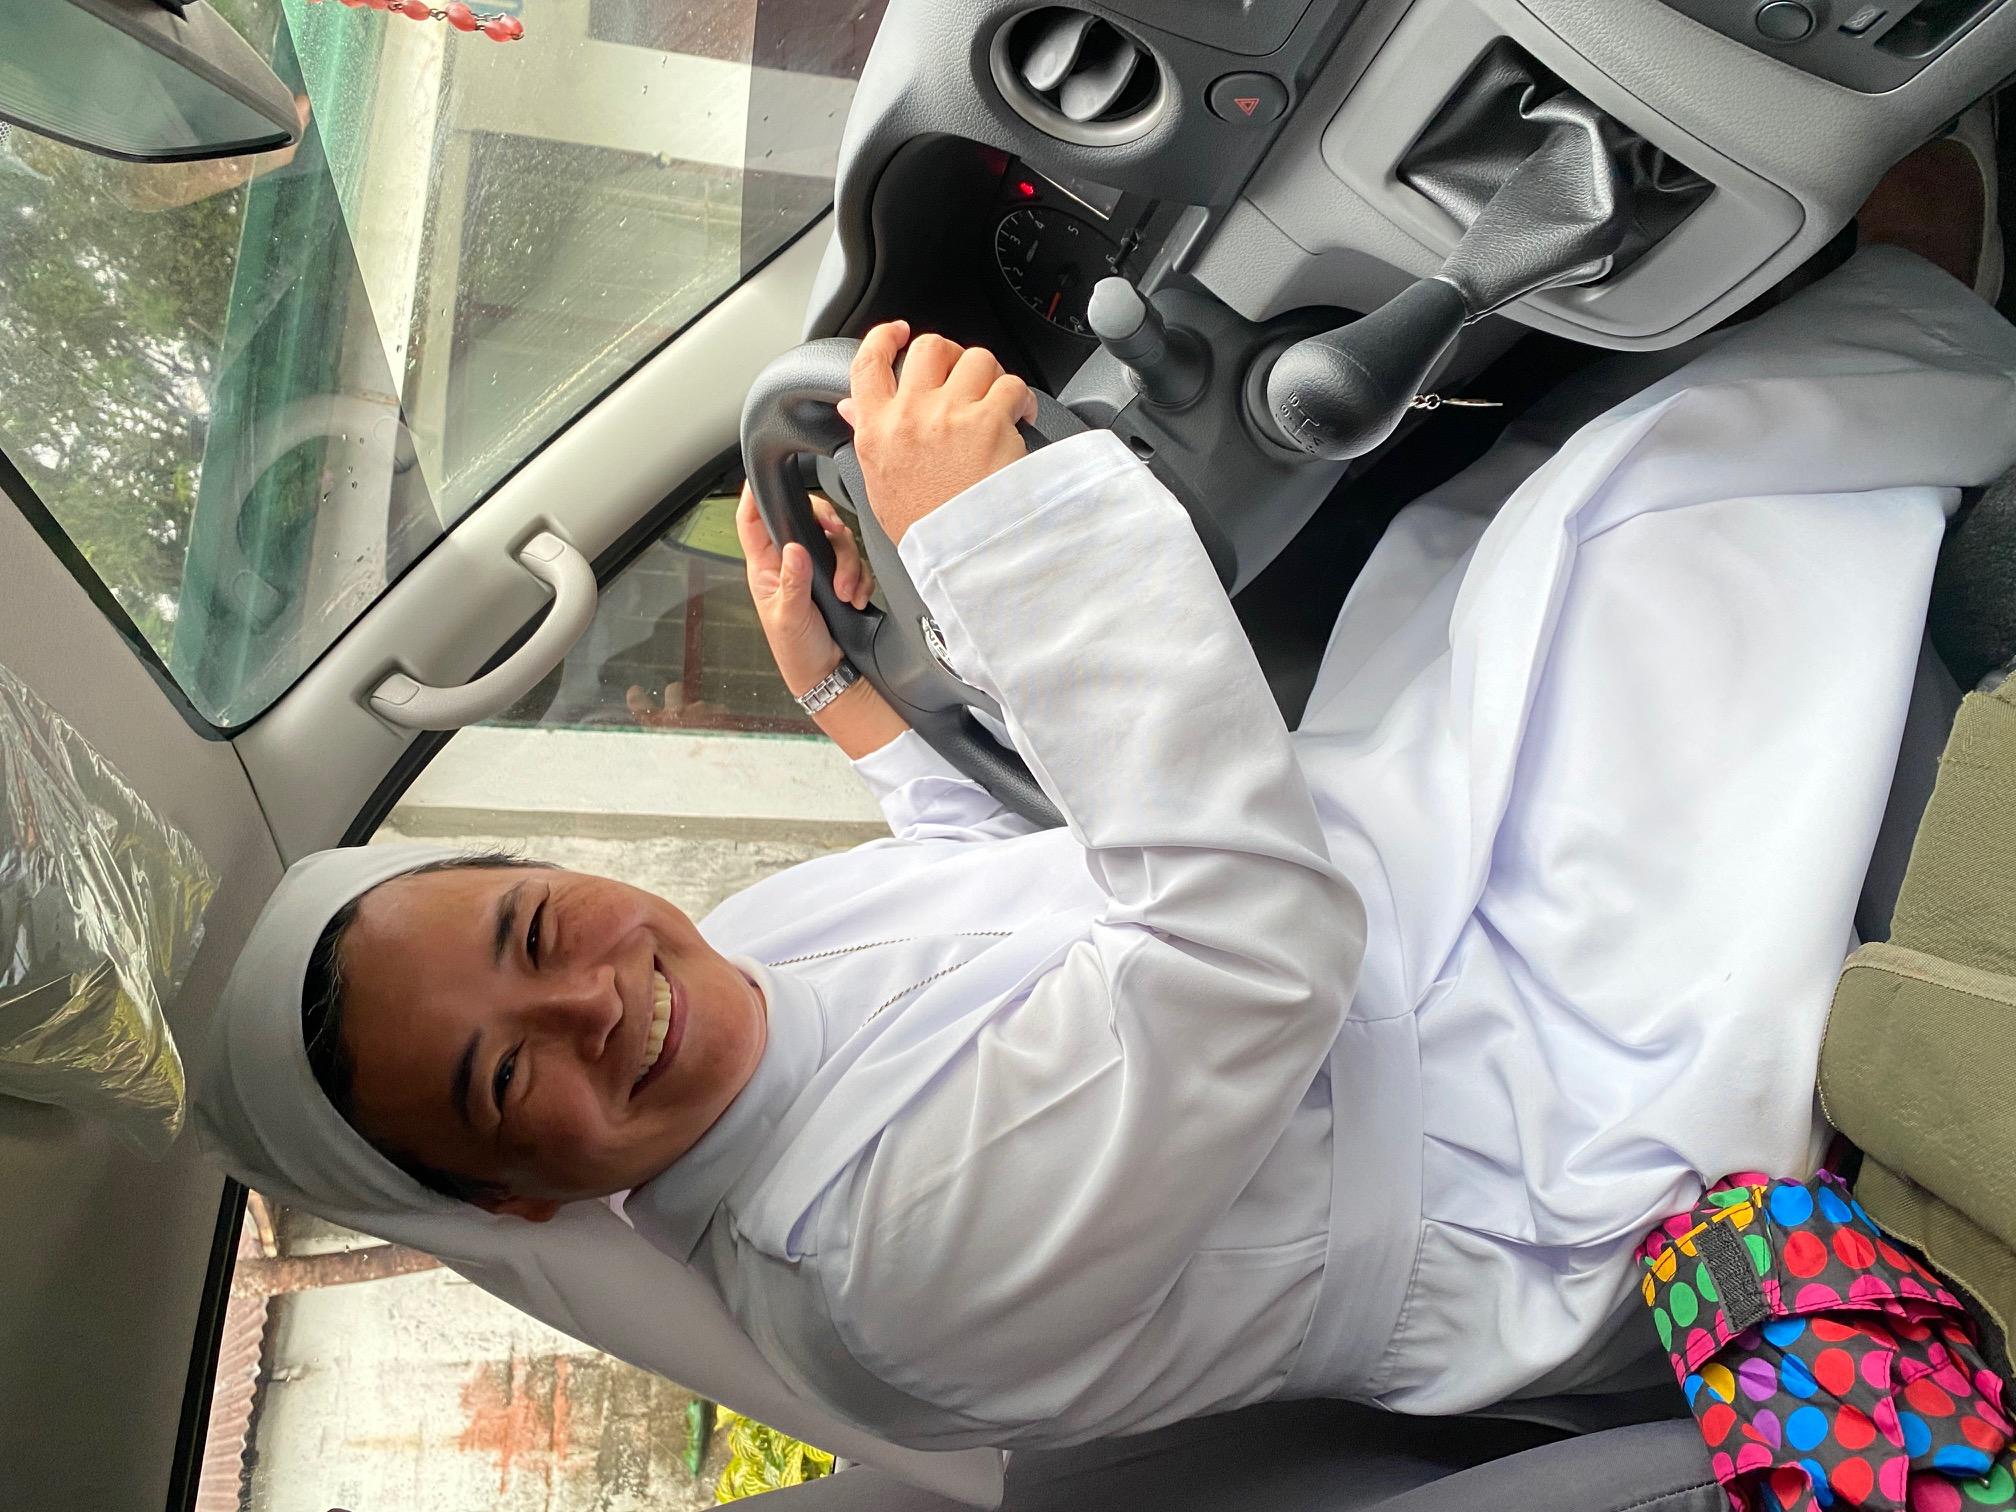 SSV Van Sr. Rubi driving